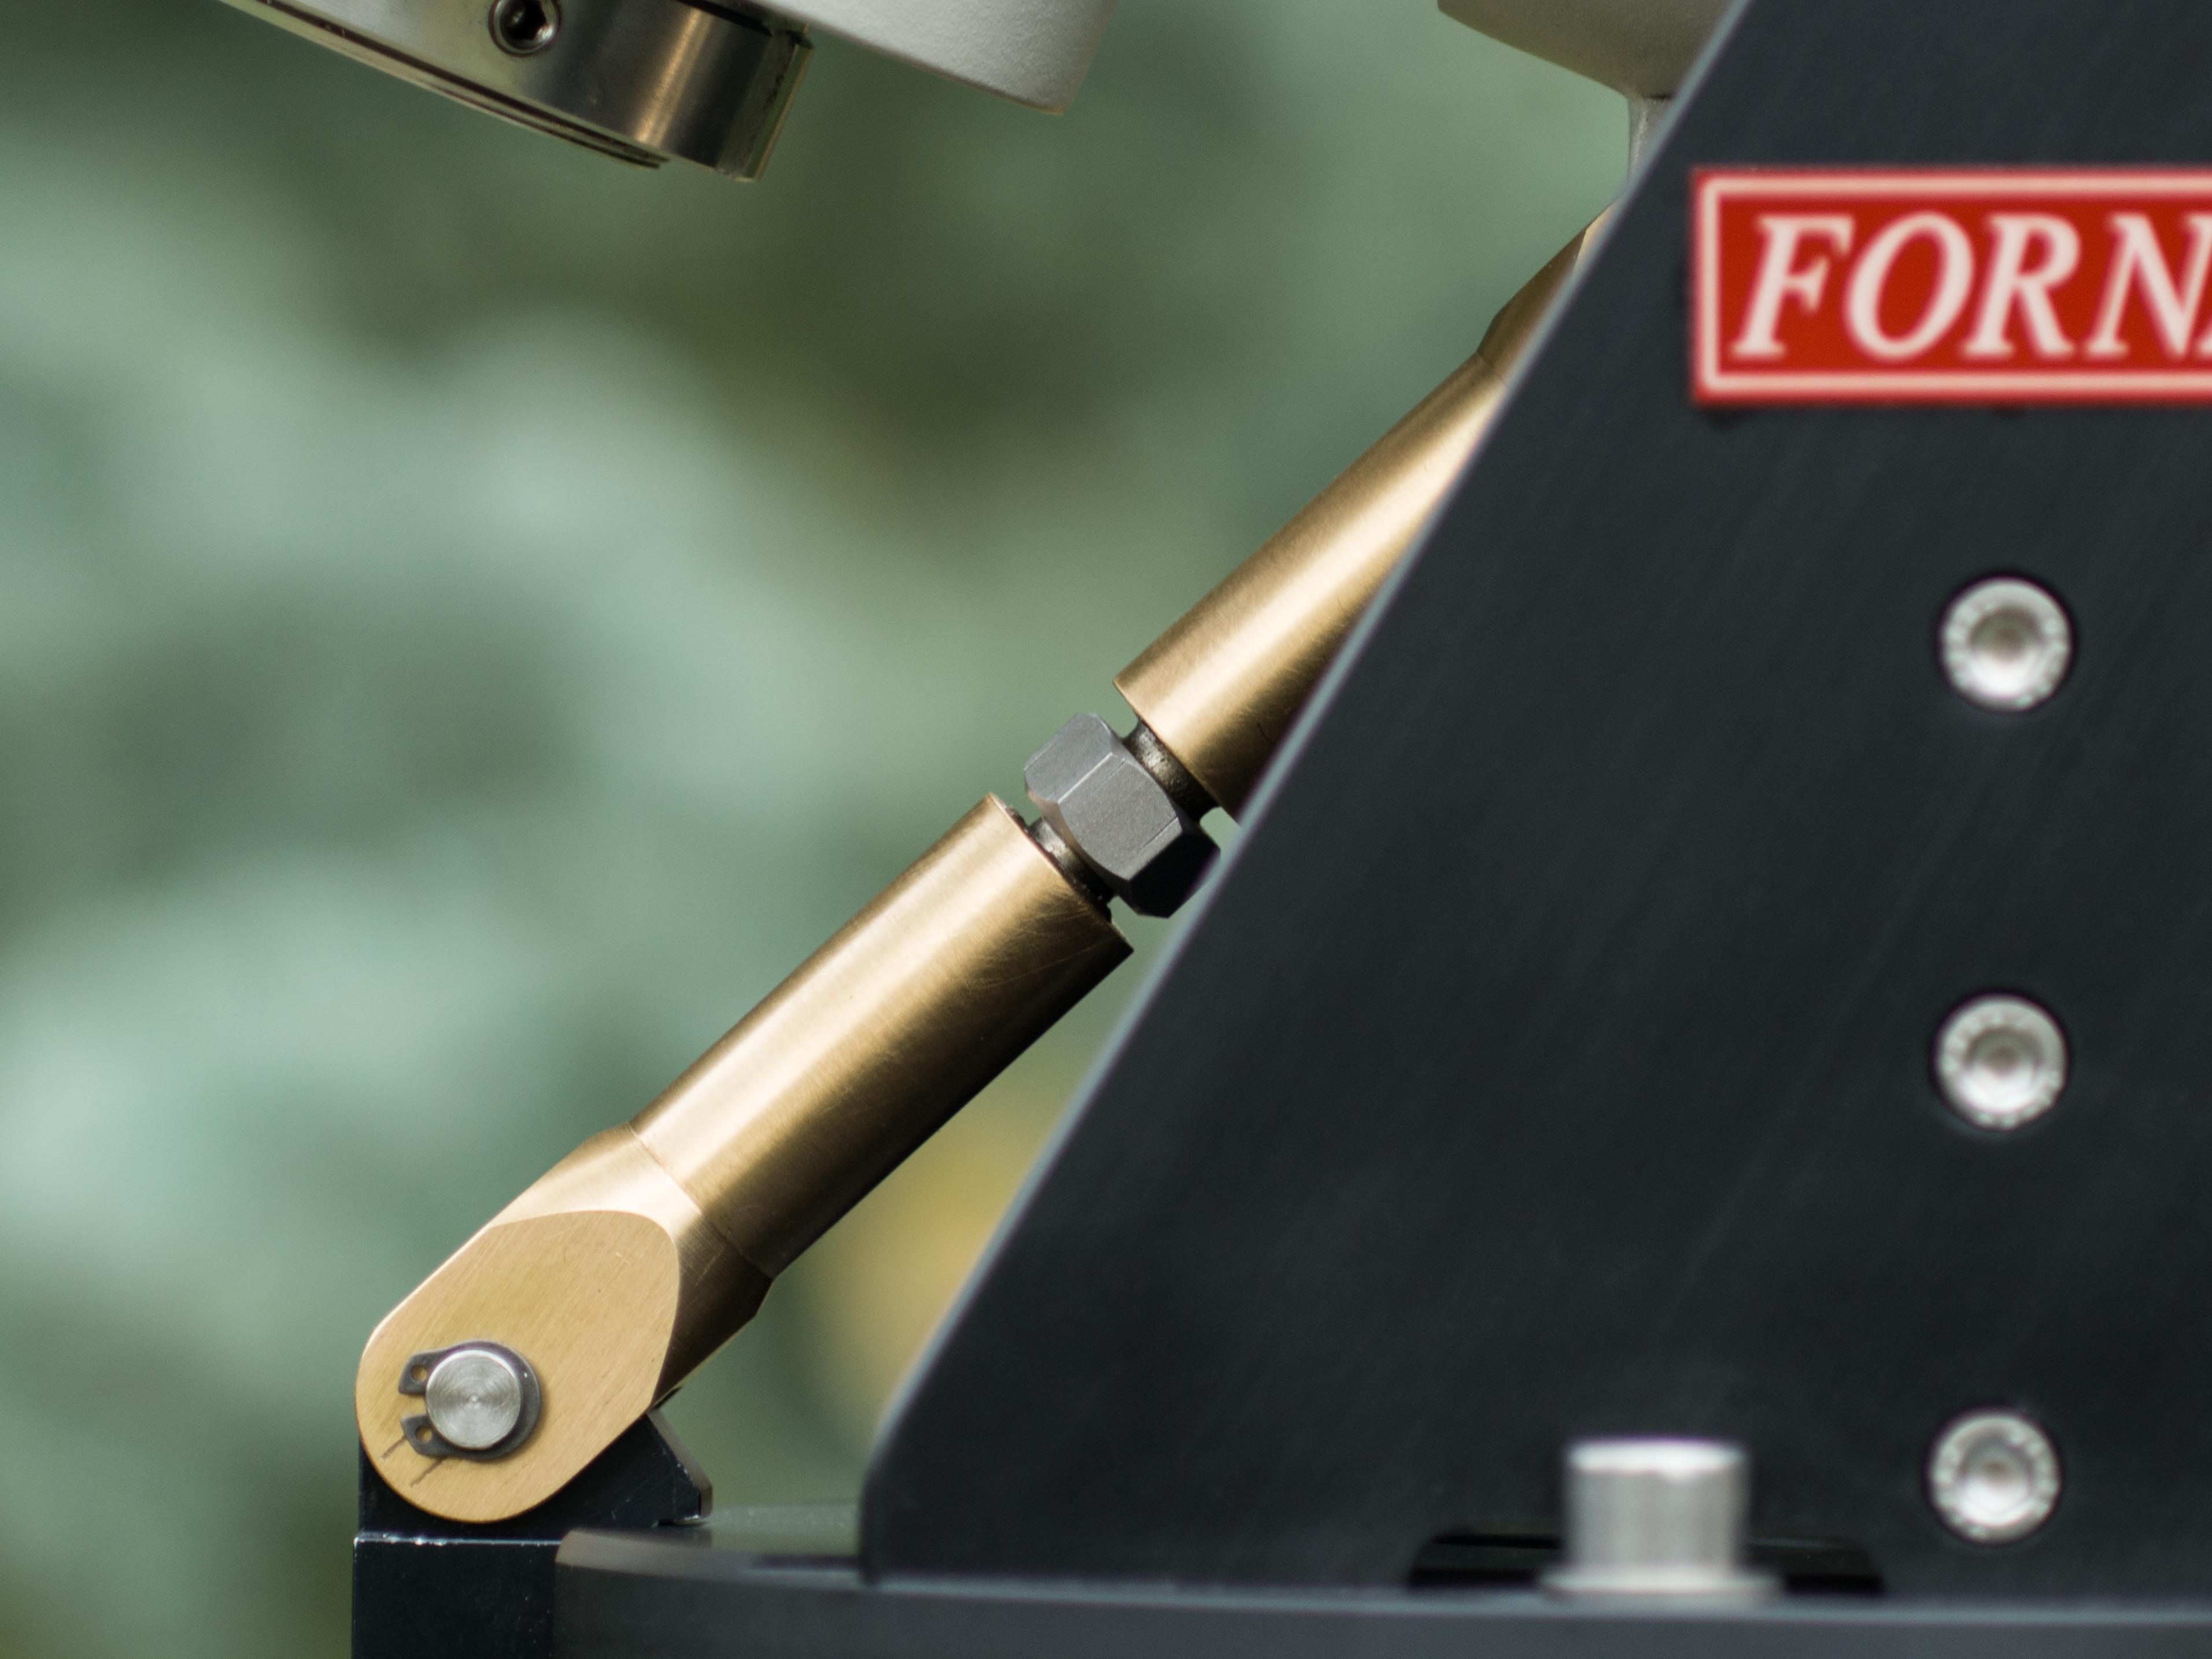 fornax 102 equatorial mount